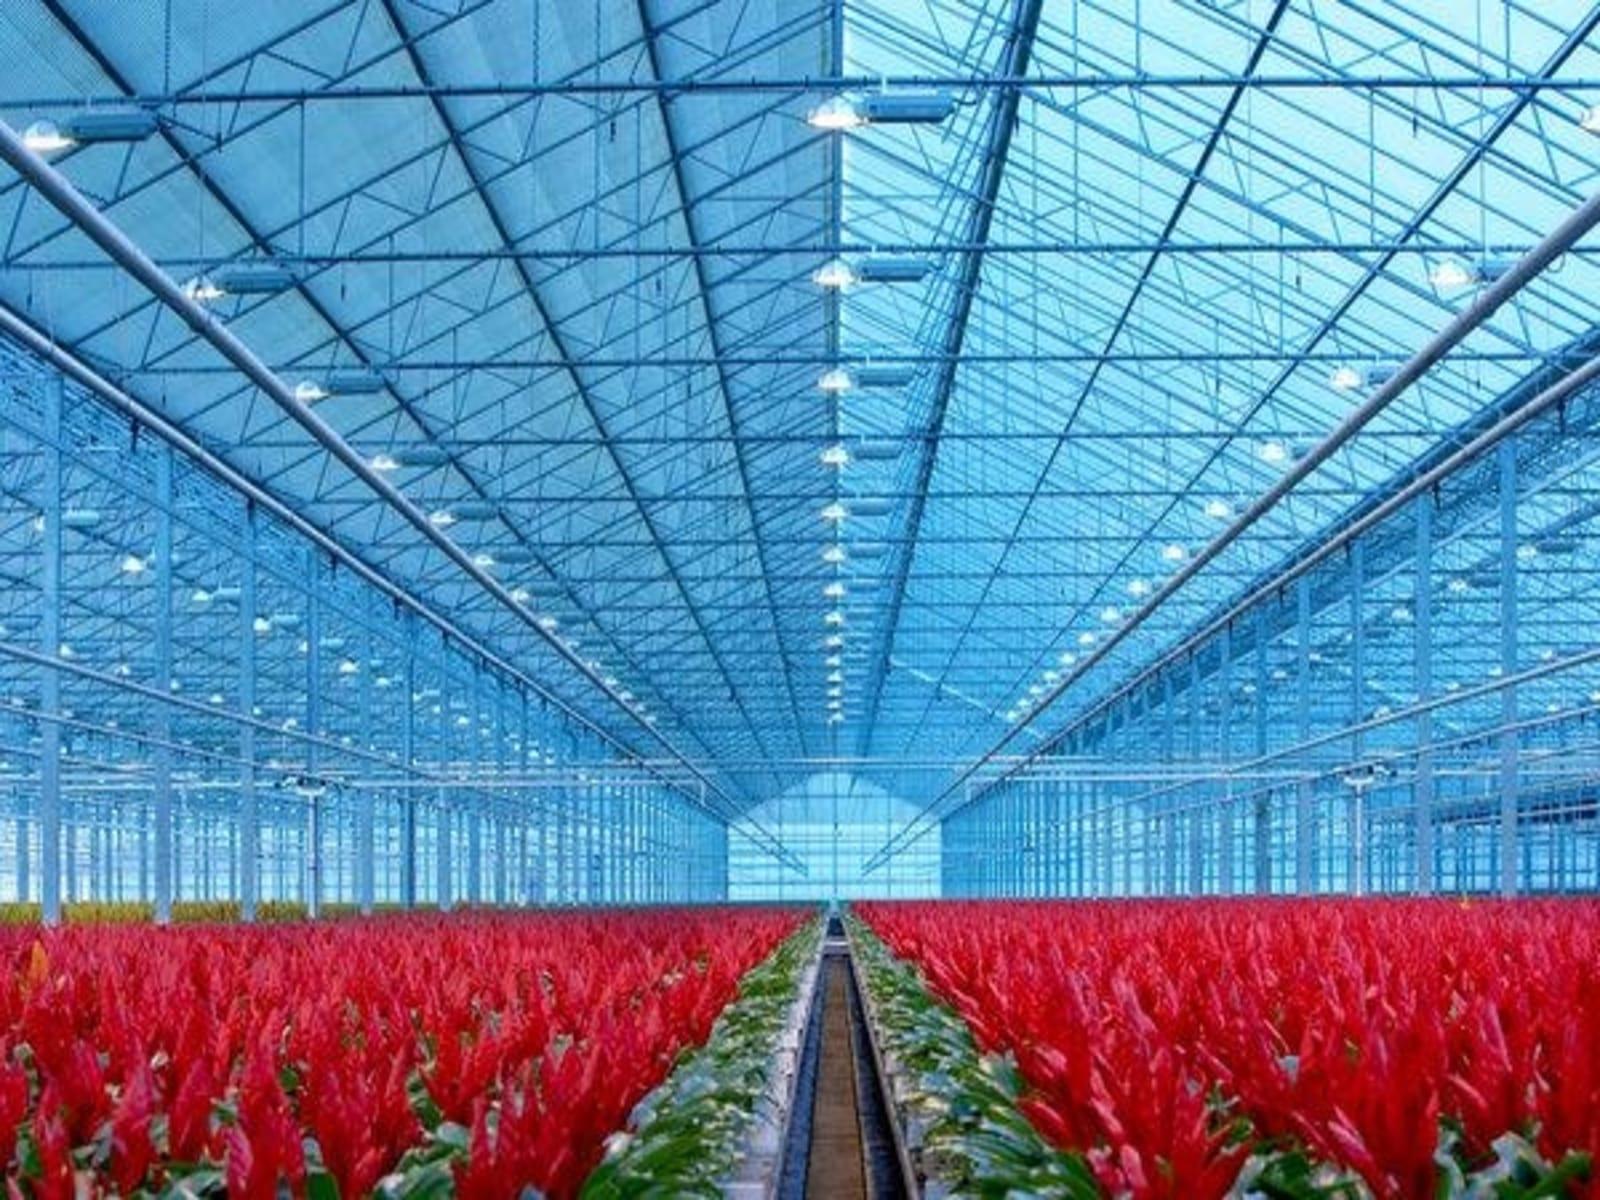 tuinbouwakkoord-greenports-nederland-greenport-duin-en-bollenstreek